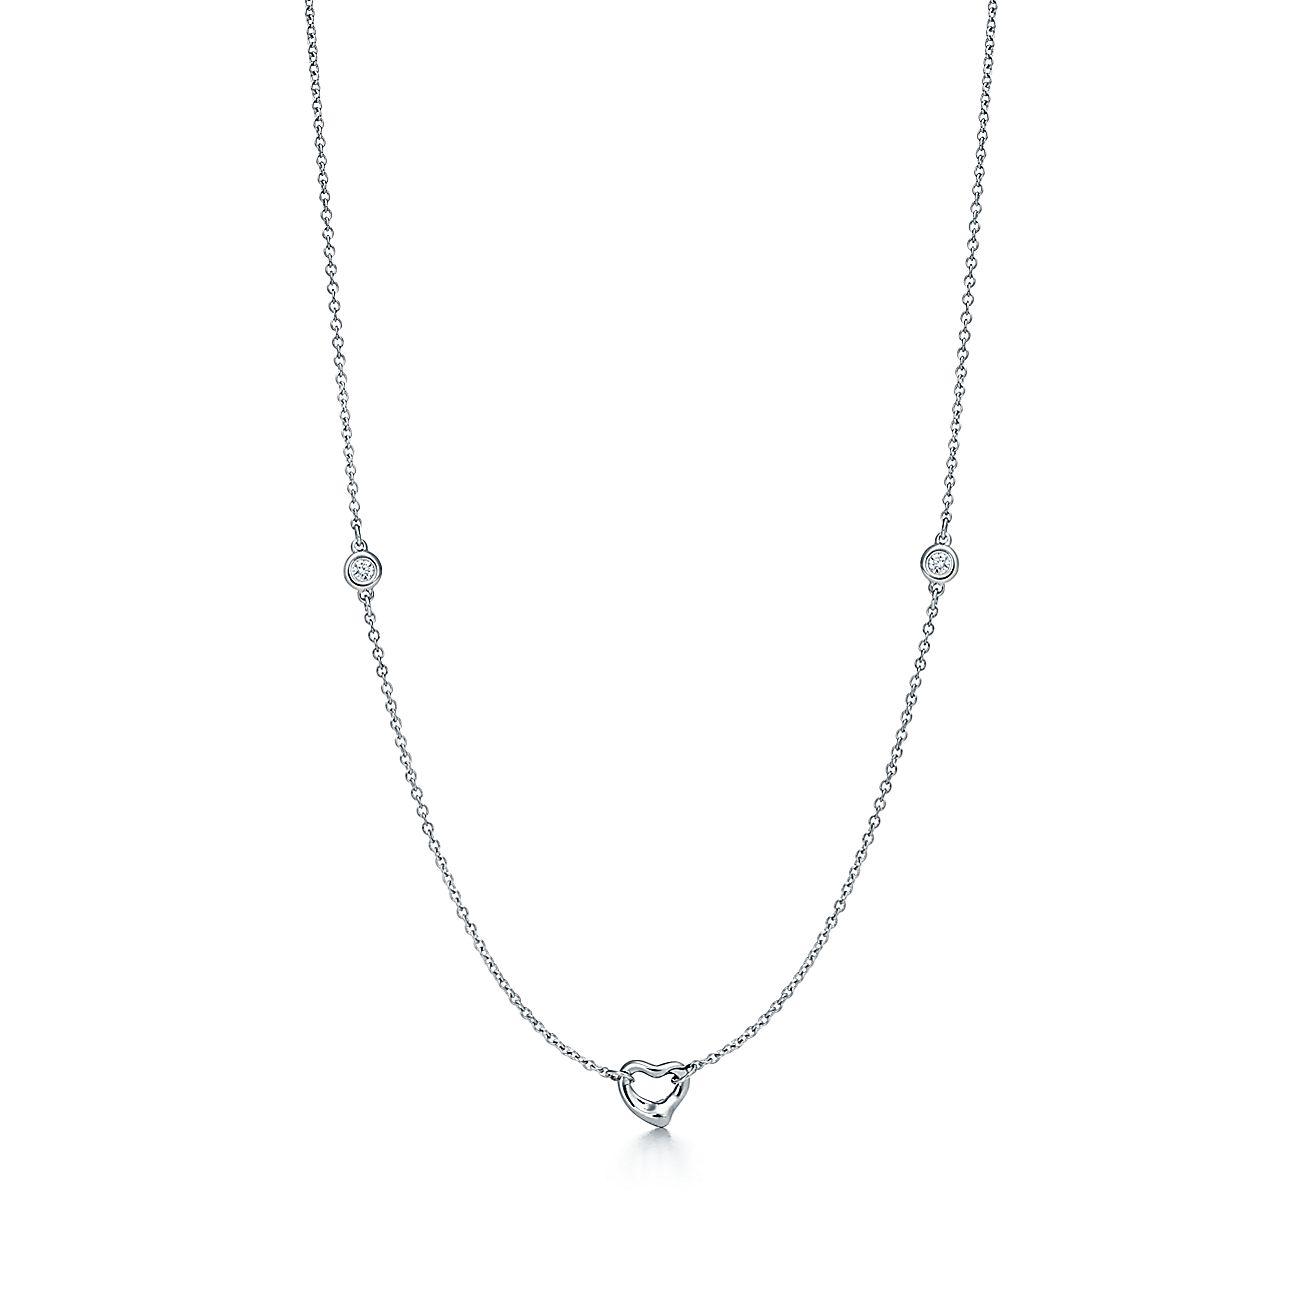 Elsa PerettiR Diamonds By The YardR Open Heart Necklace In Sterling Silver